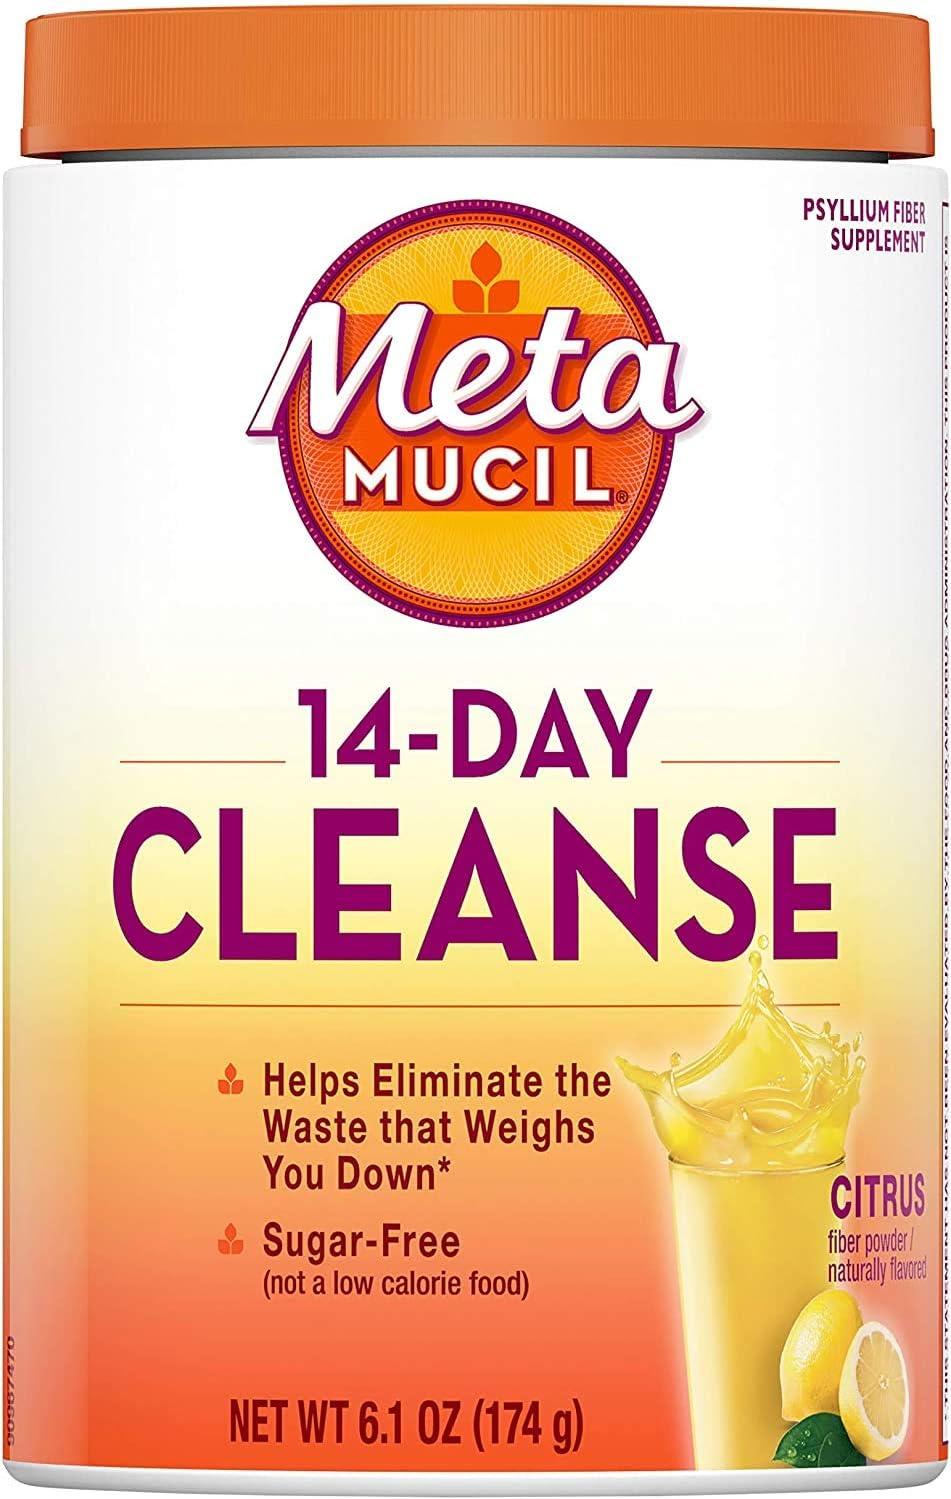 Amazon Com Metamucil 14 Day Cleanse Fiber Eliminate Waste 30 Servings Psyllium Husk Fiber Supplement Sugar Free Powder Citrus Flavored Drink Health Personal Care